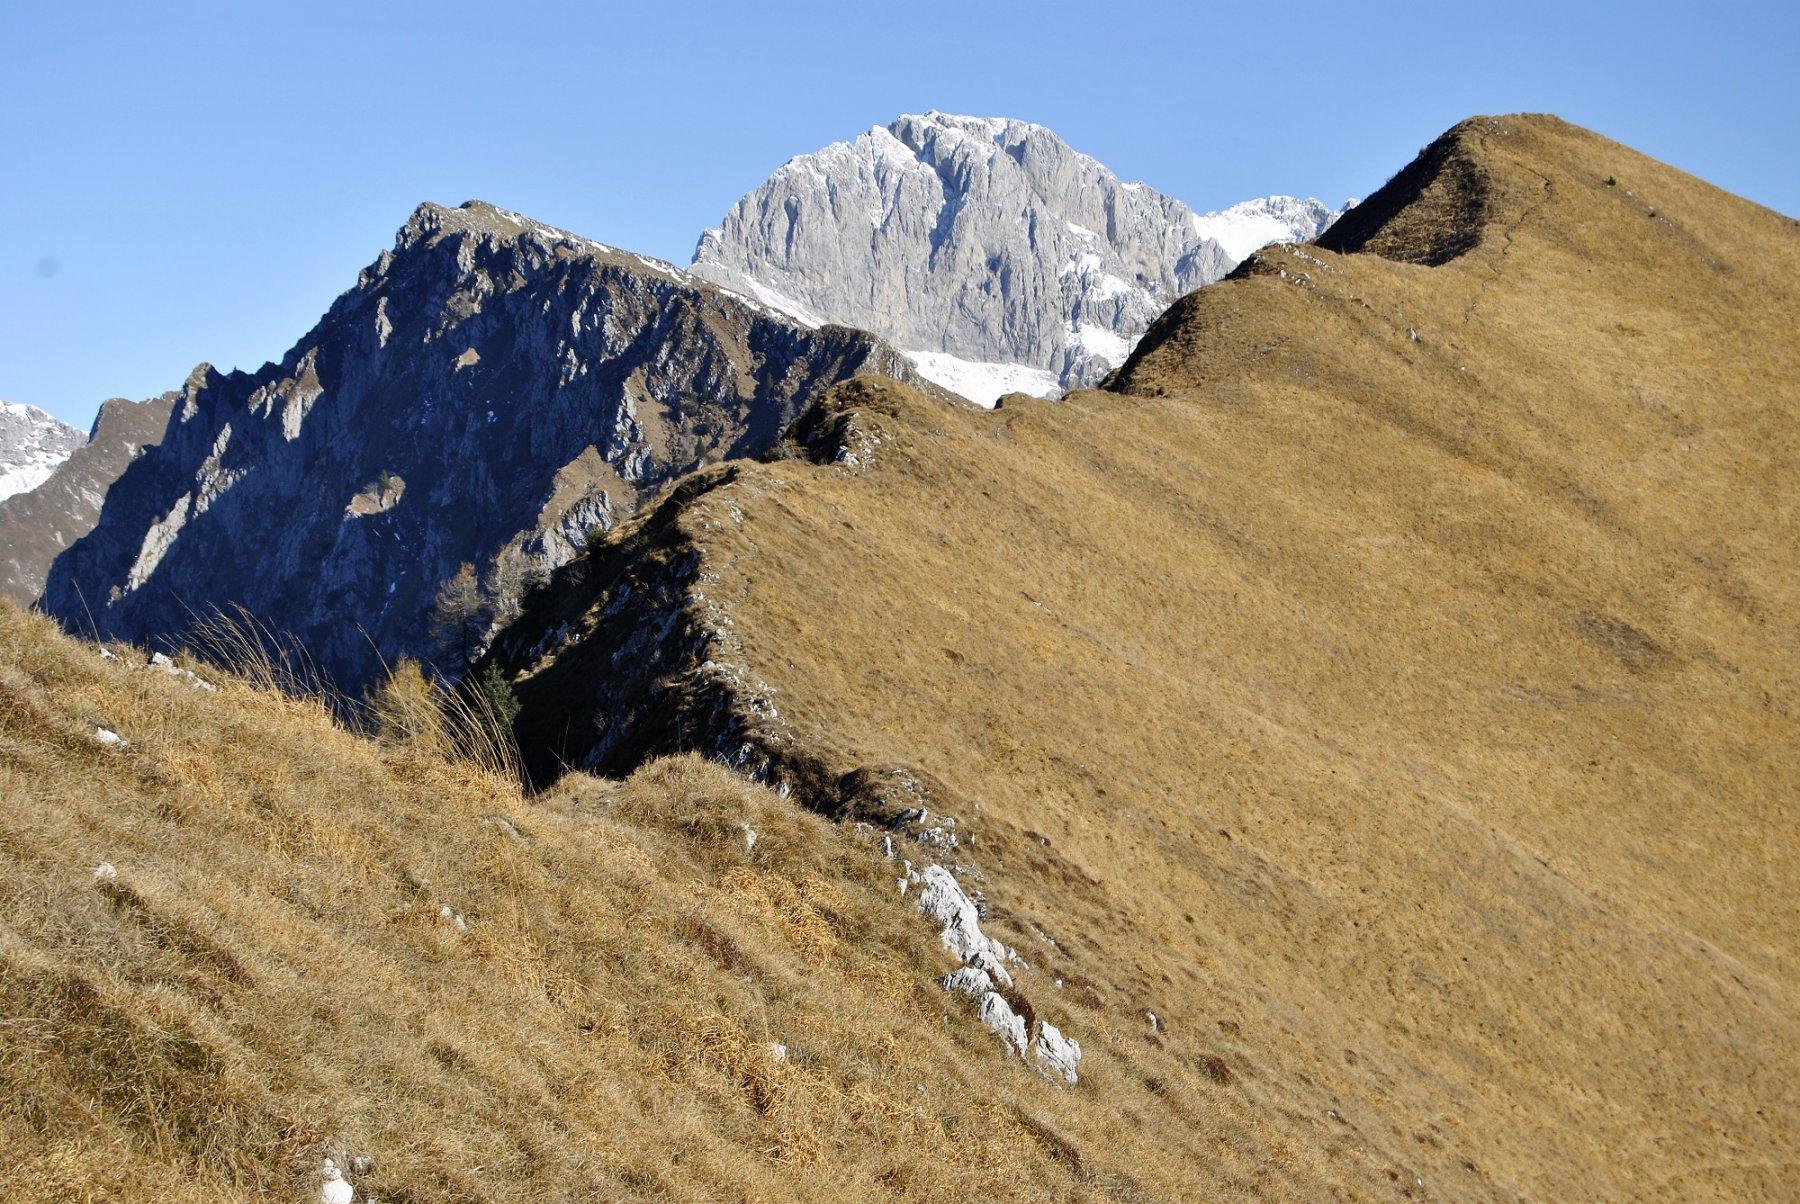 Valsacco (Monte) da Clusone per i monti Simer, Blum e Parè 2017-11-16